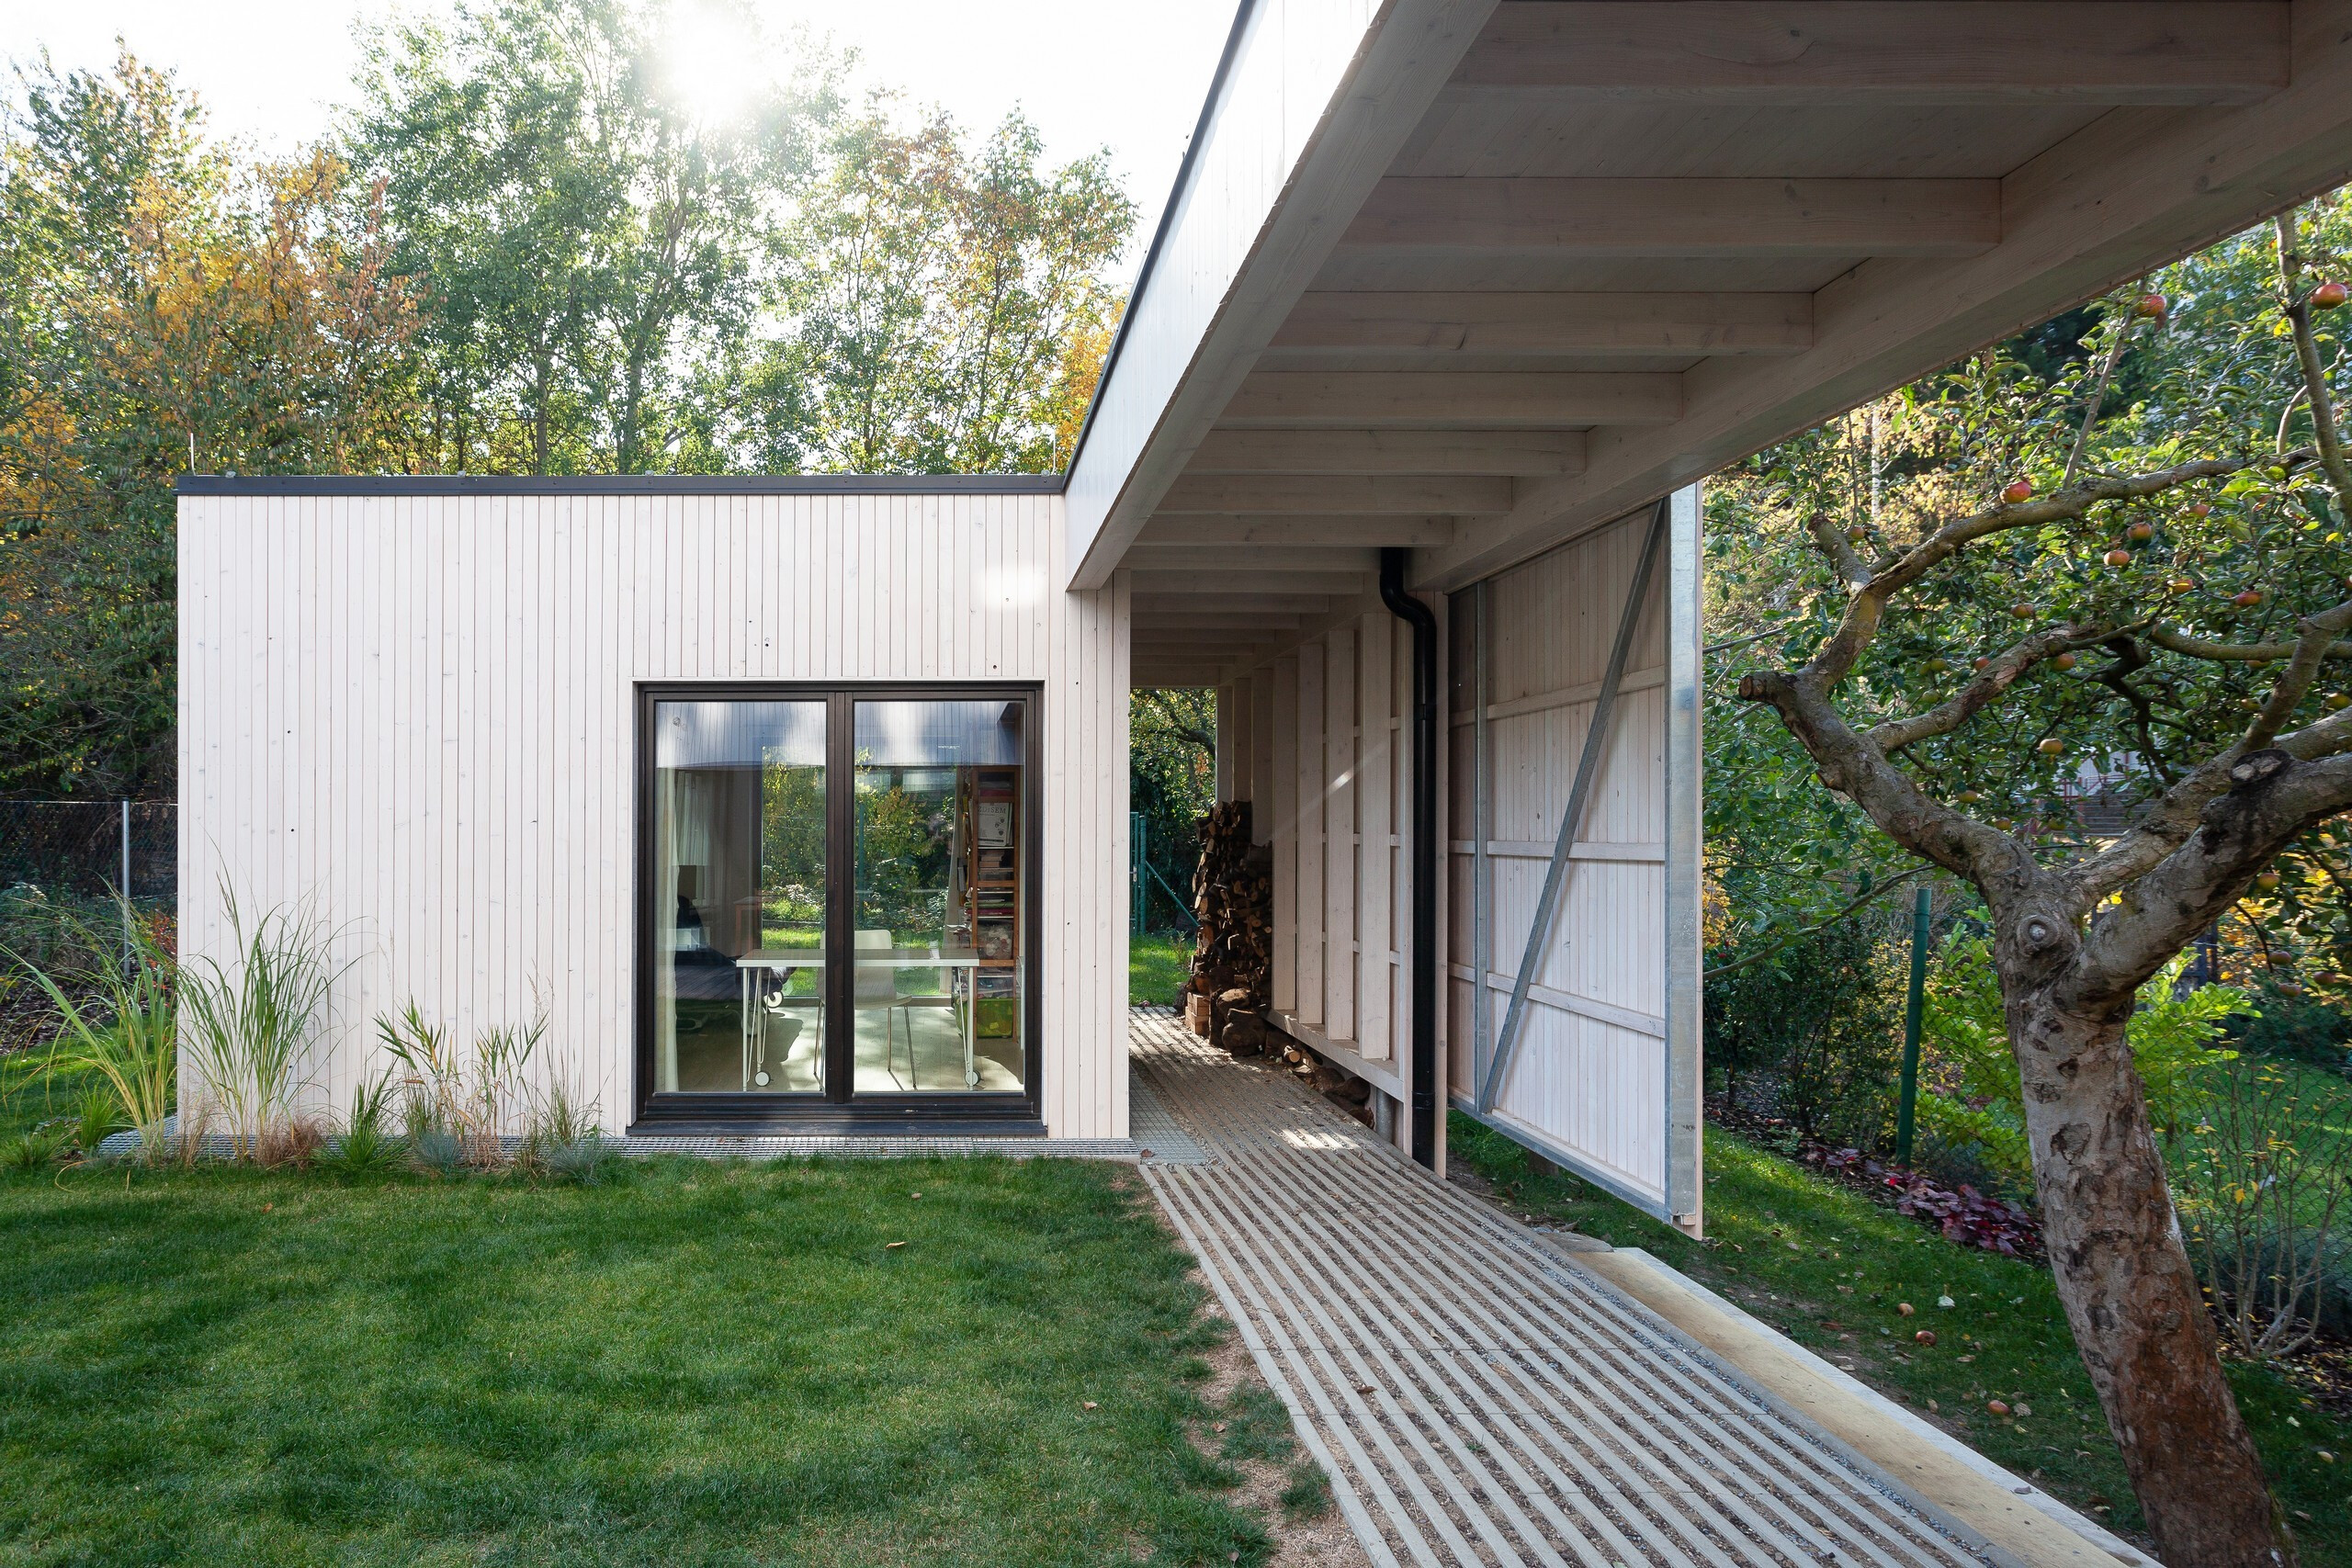 House over the backyard